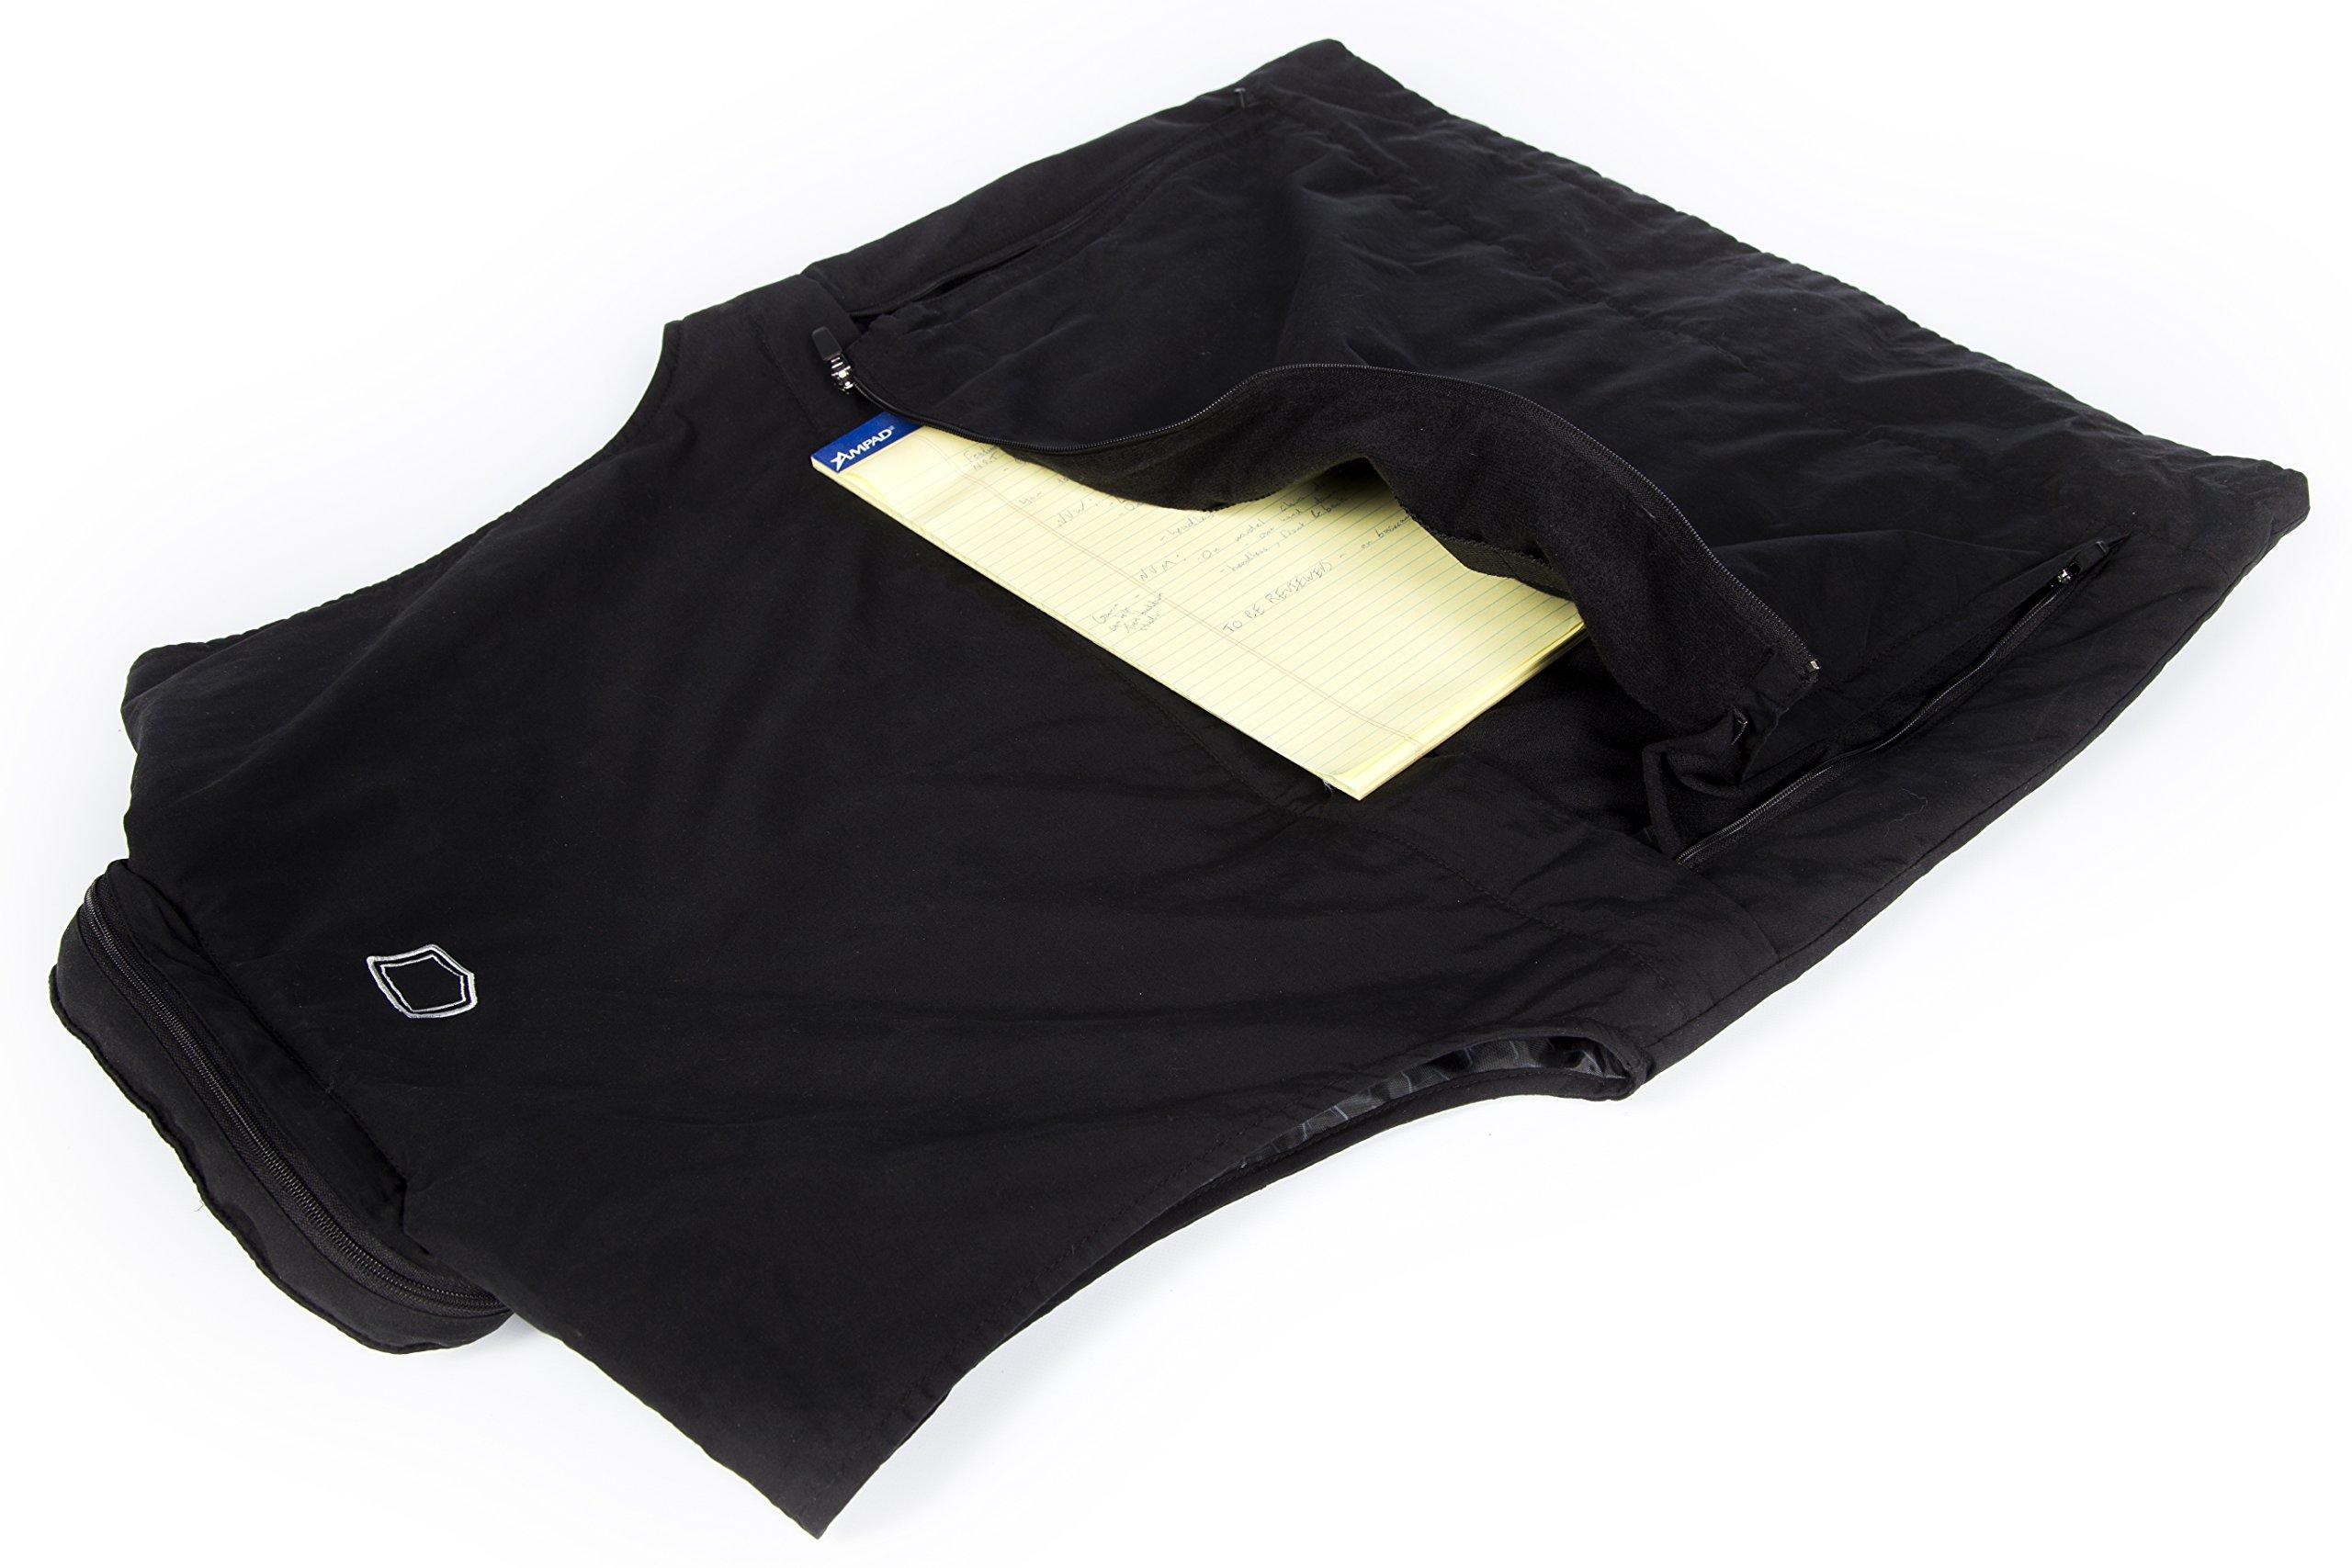 SCOTTeVEST Men's Q.U.E.S.T. Vest - 42 Pockets – Photography, Travel Vest BLK XLT by SCOTTeVEST (Image #6)